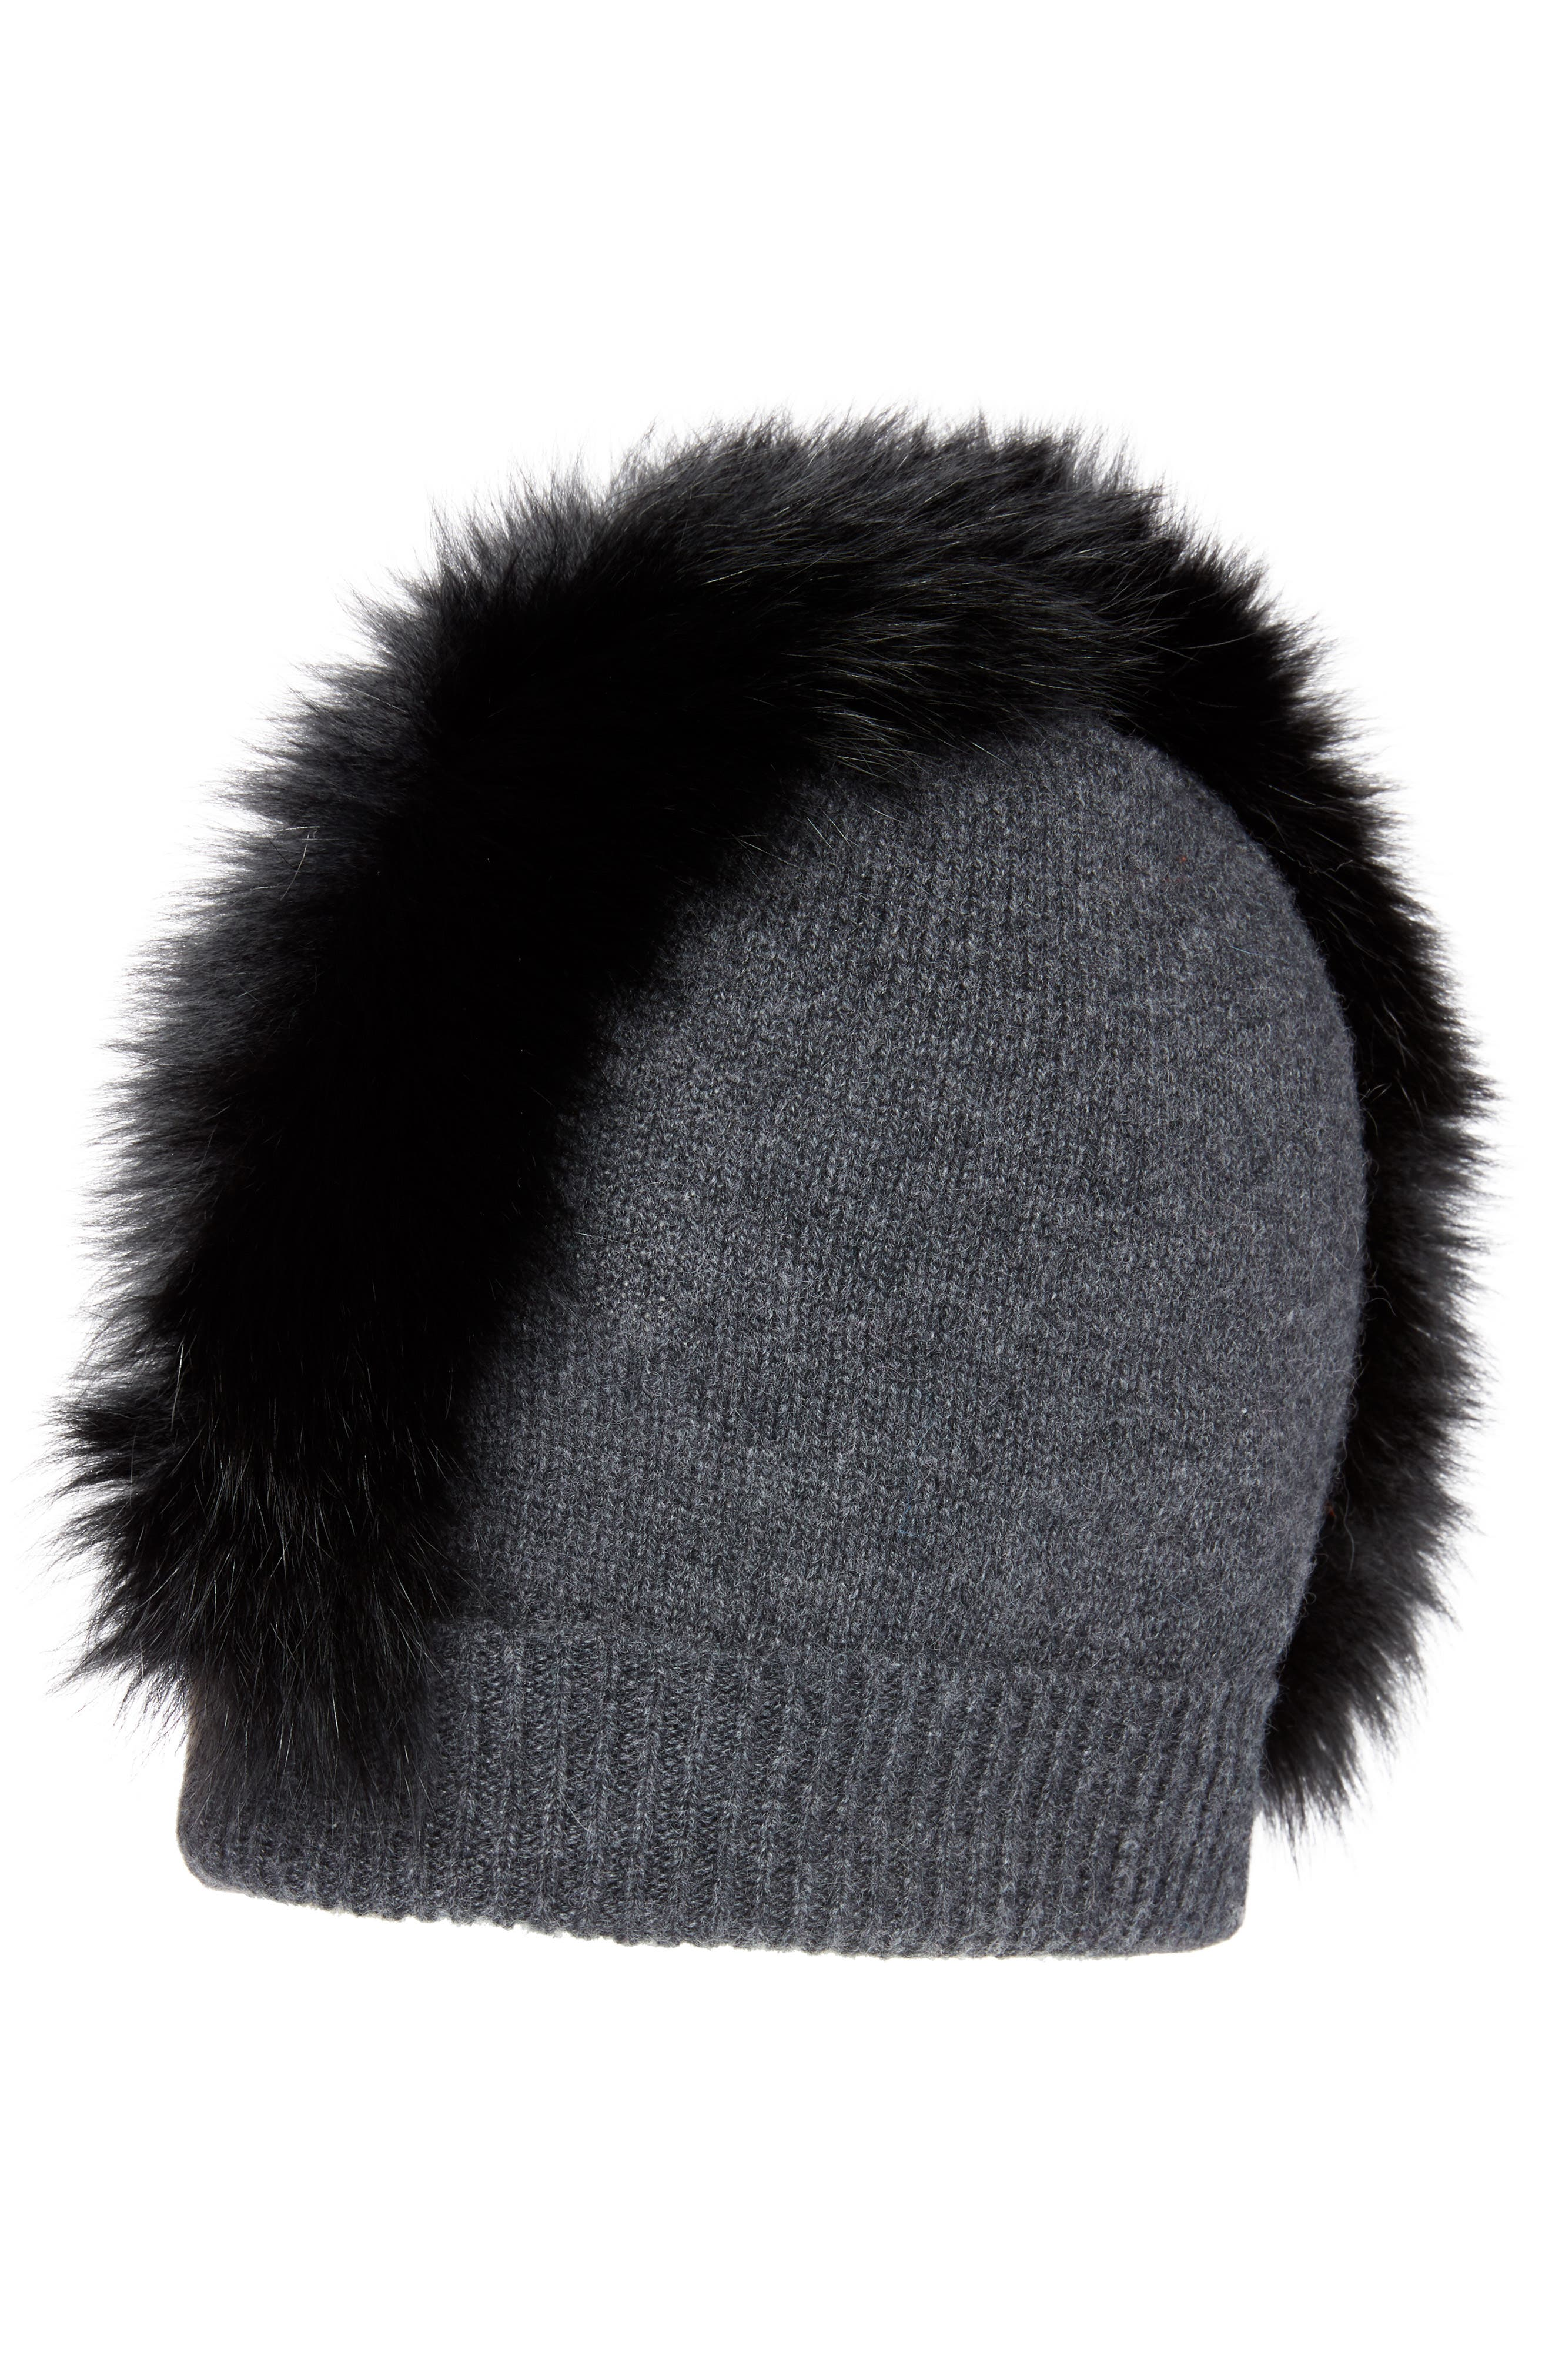 9f8c6aea739 Cashmere   Cashmere Blend Hats for Women